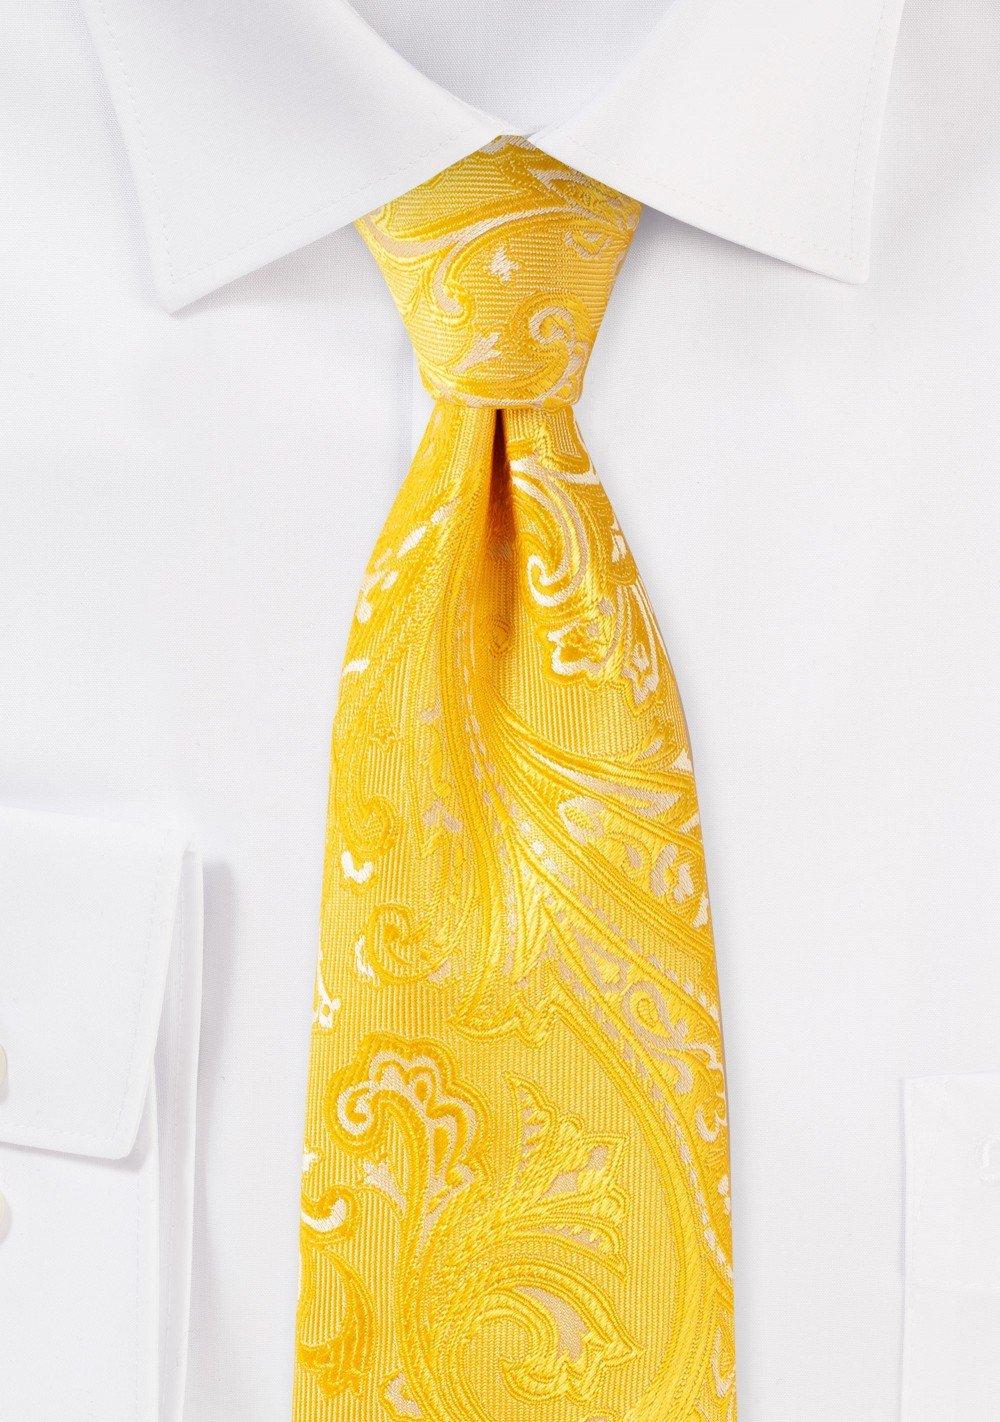 Canary Yellow Paisley Tie